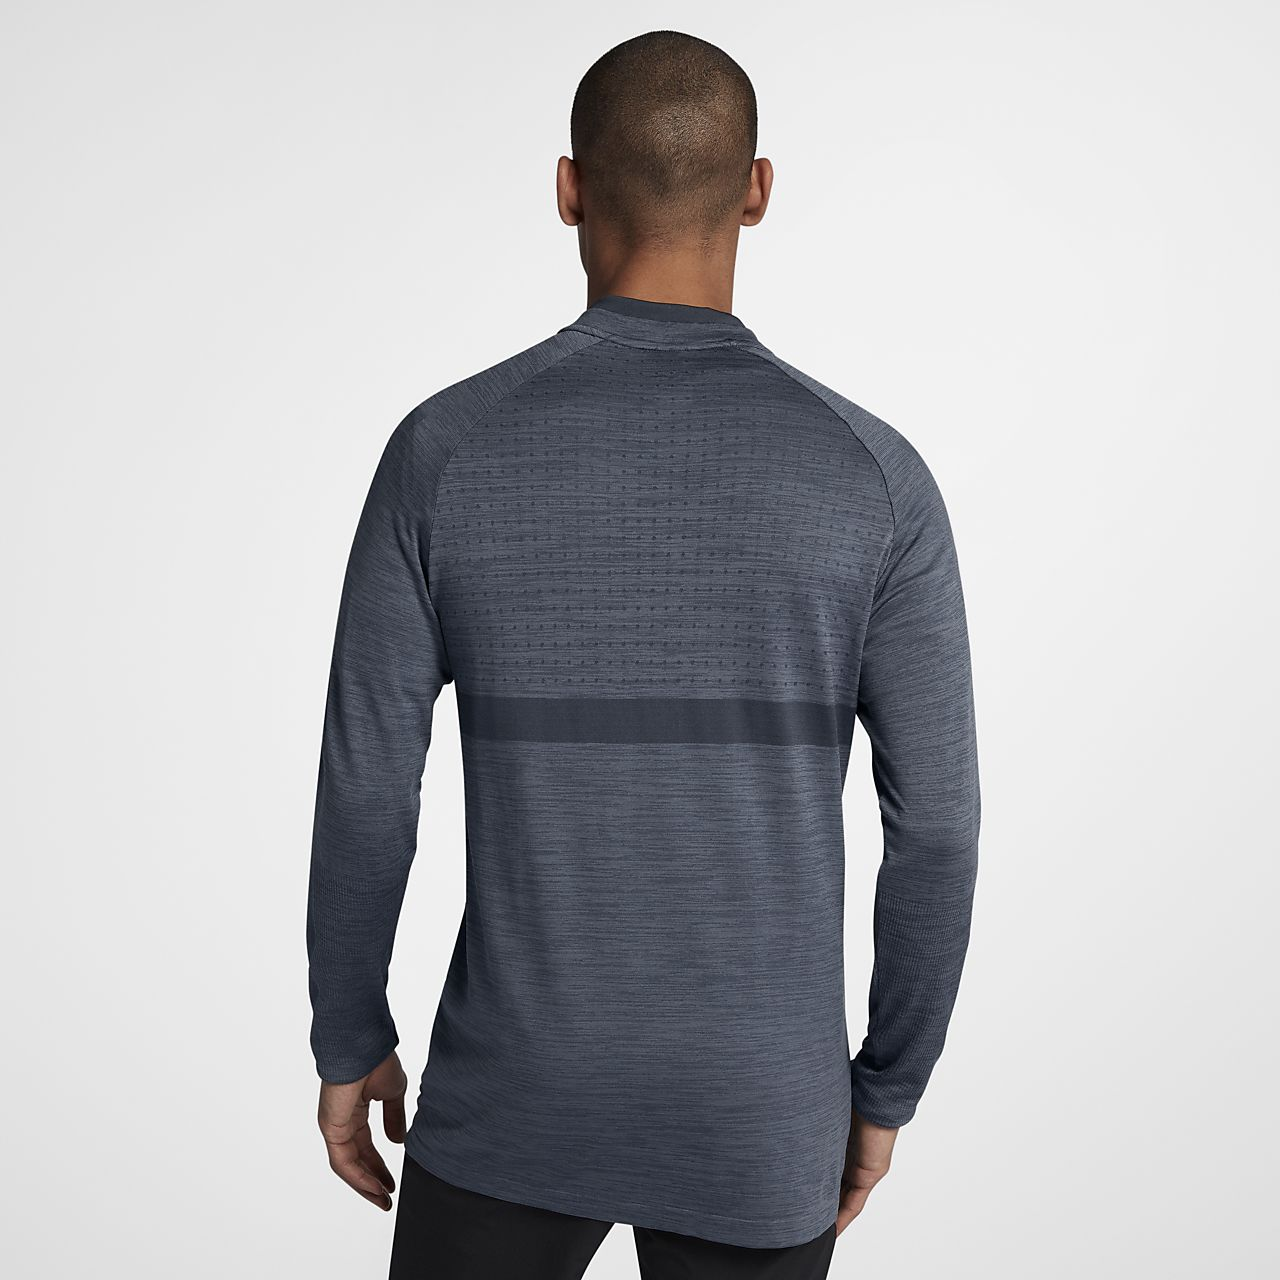 ... Nike Dri-FIT Men's Half-Zip Golf Top